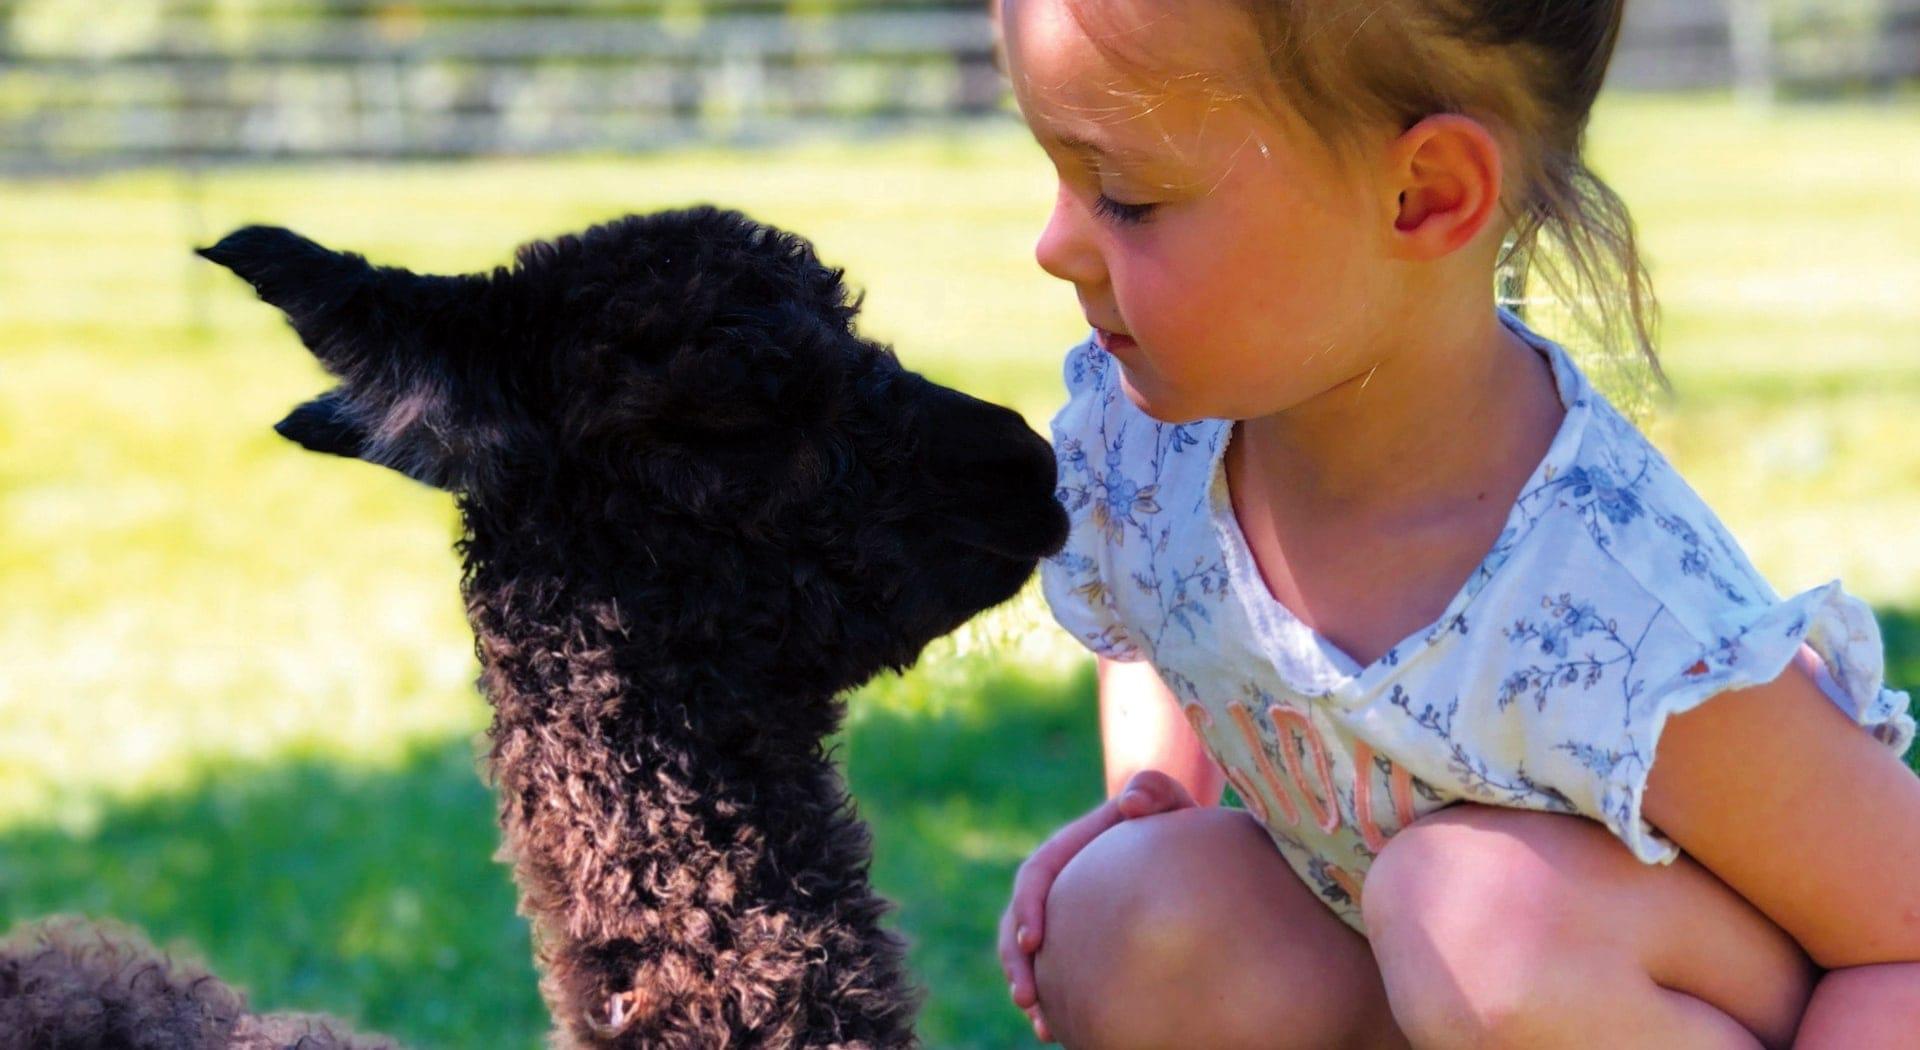 family-friendly farms